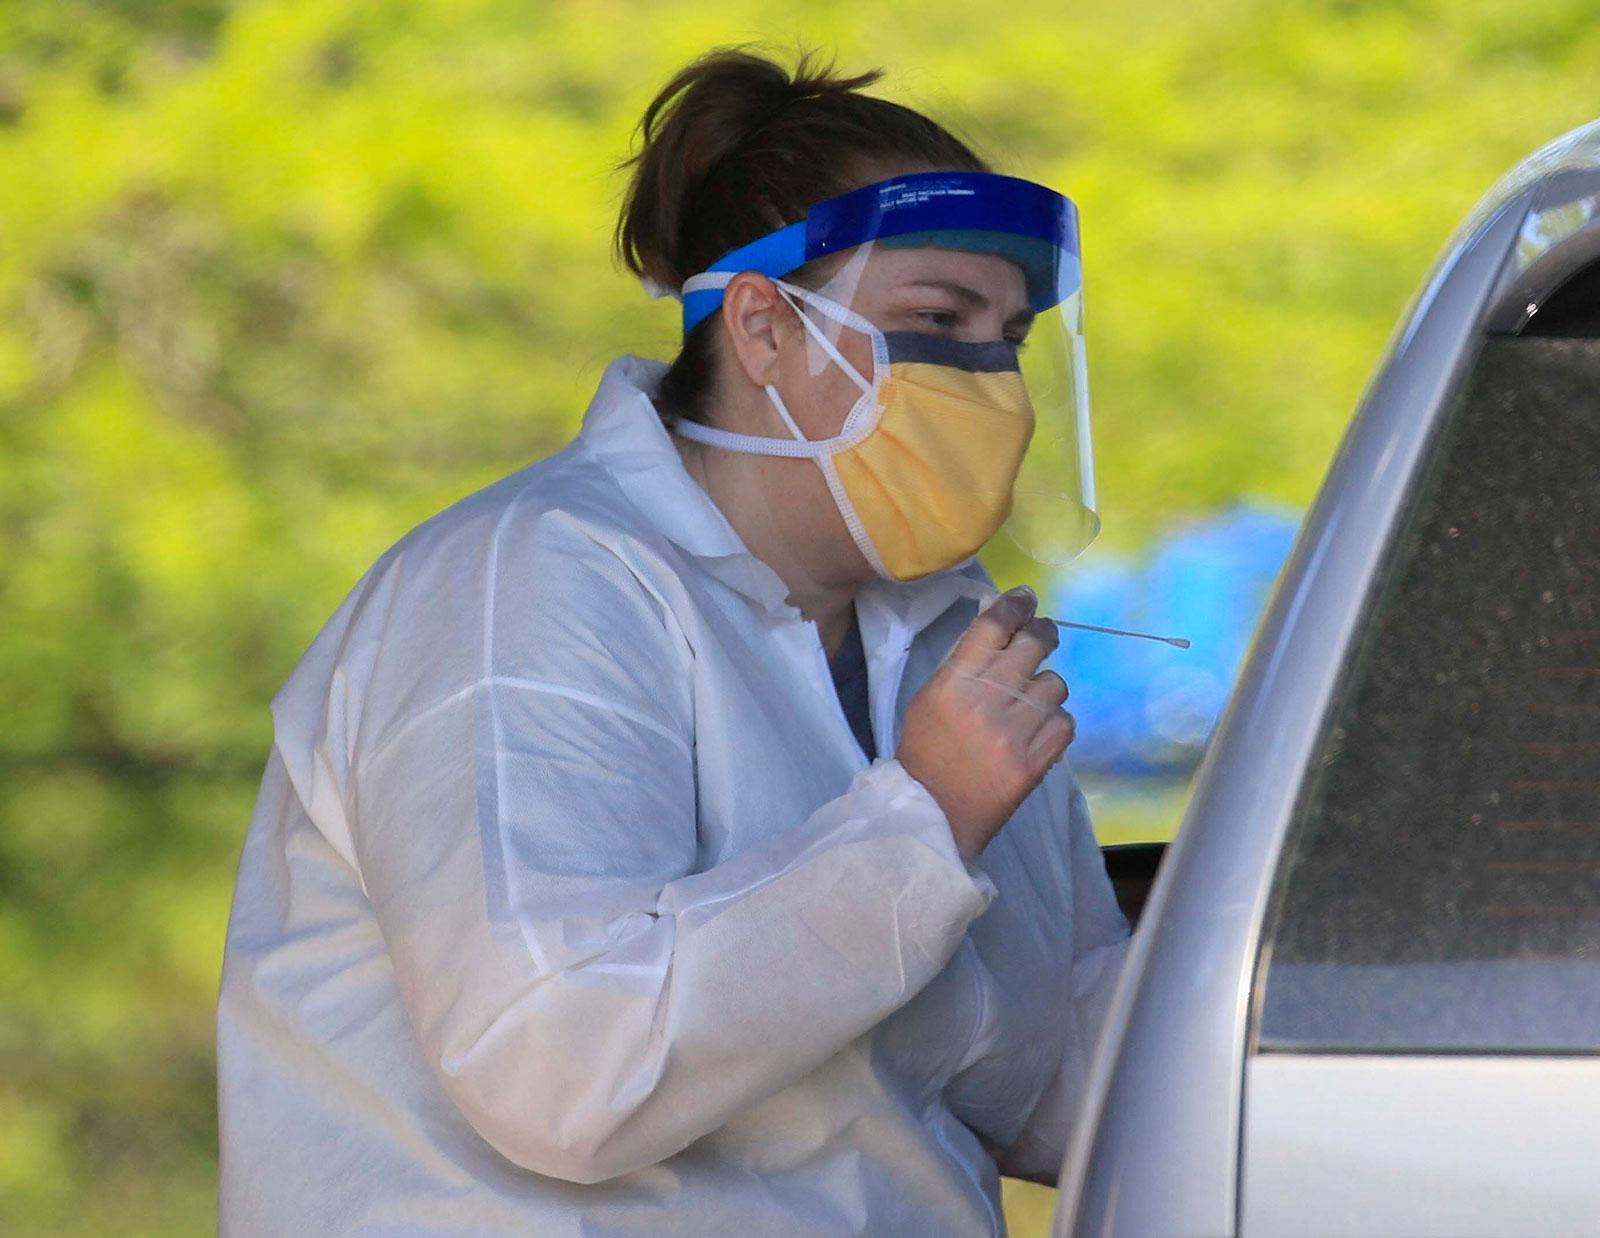 Nurse Tonya Green administers a coronvirus test at a drive-thru testing center in North Little Rock, Arkansas, on April 20.